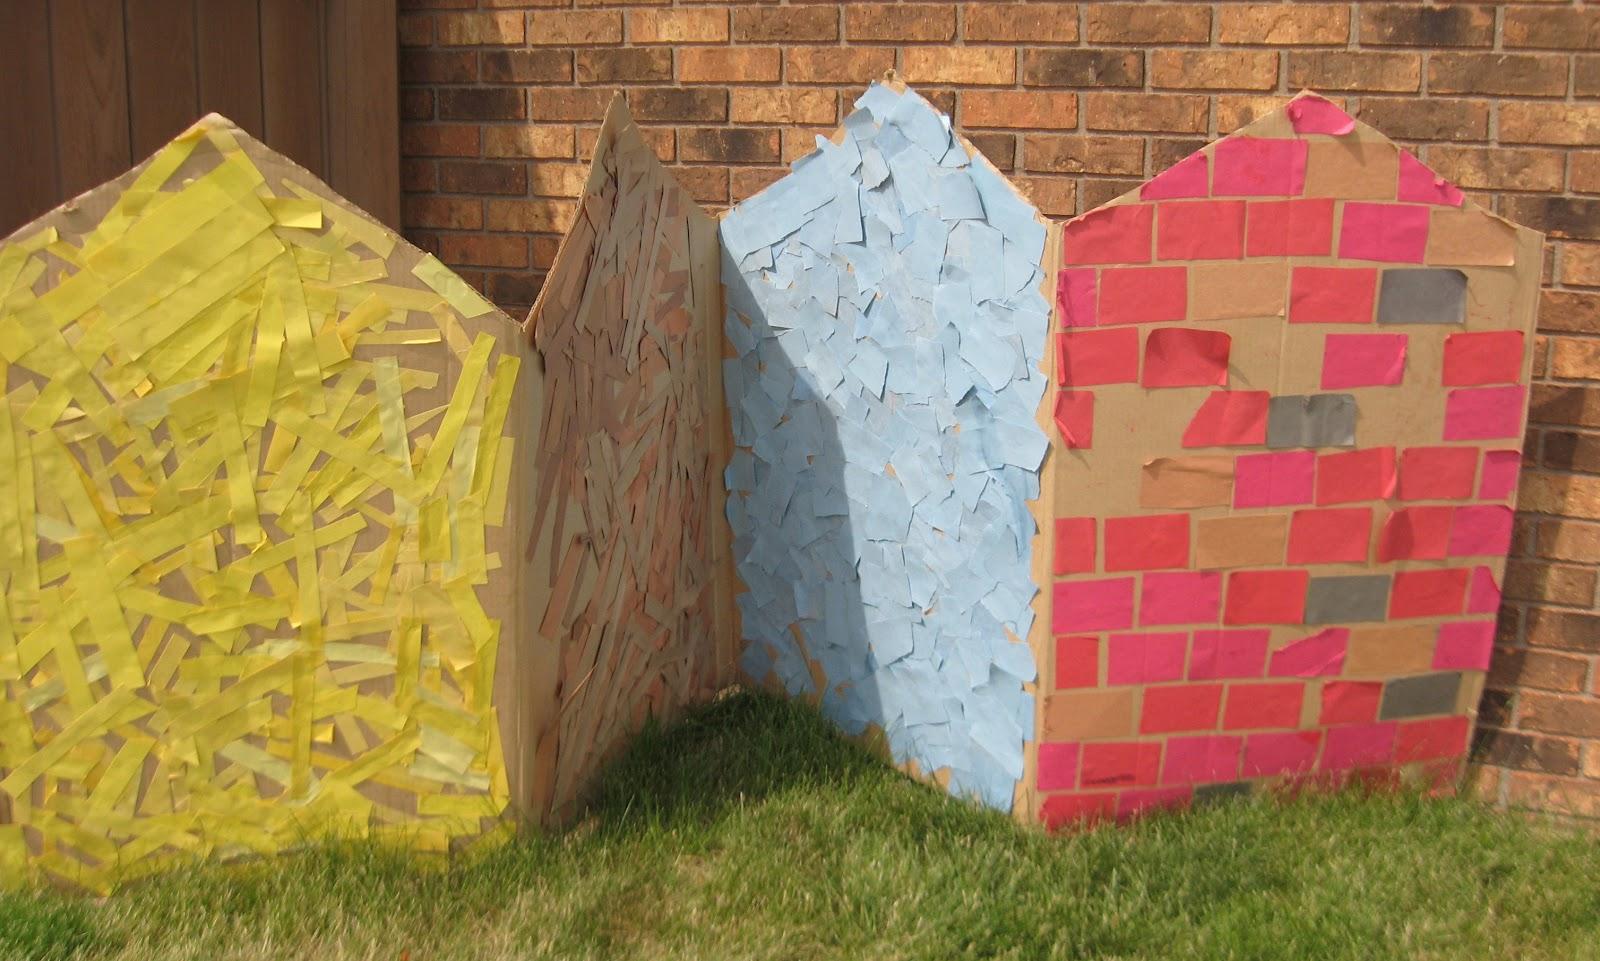 Metamora Community Preschool: Little Pigs, Little Pigs!